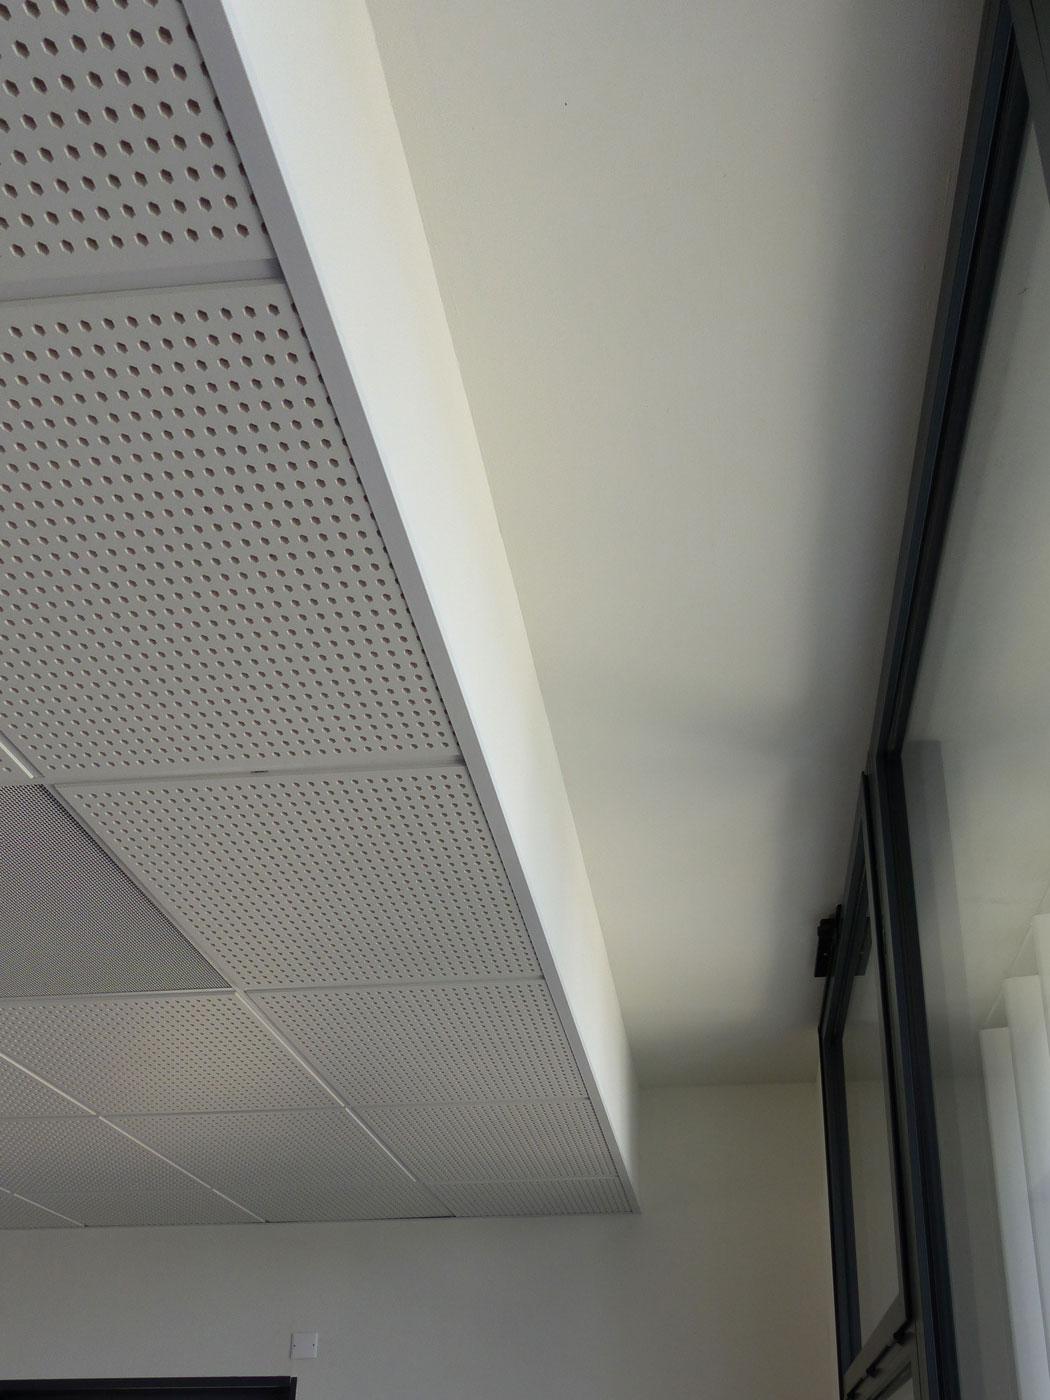 Langlois Sobreti Quimper Siege Cerfrance Plafond Gytpone Sixto 60 Jouee